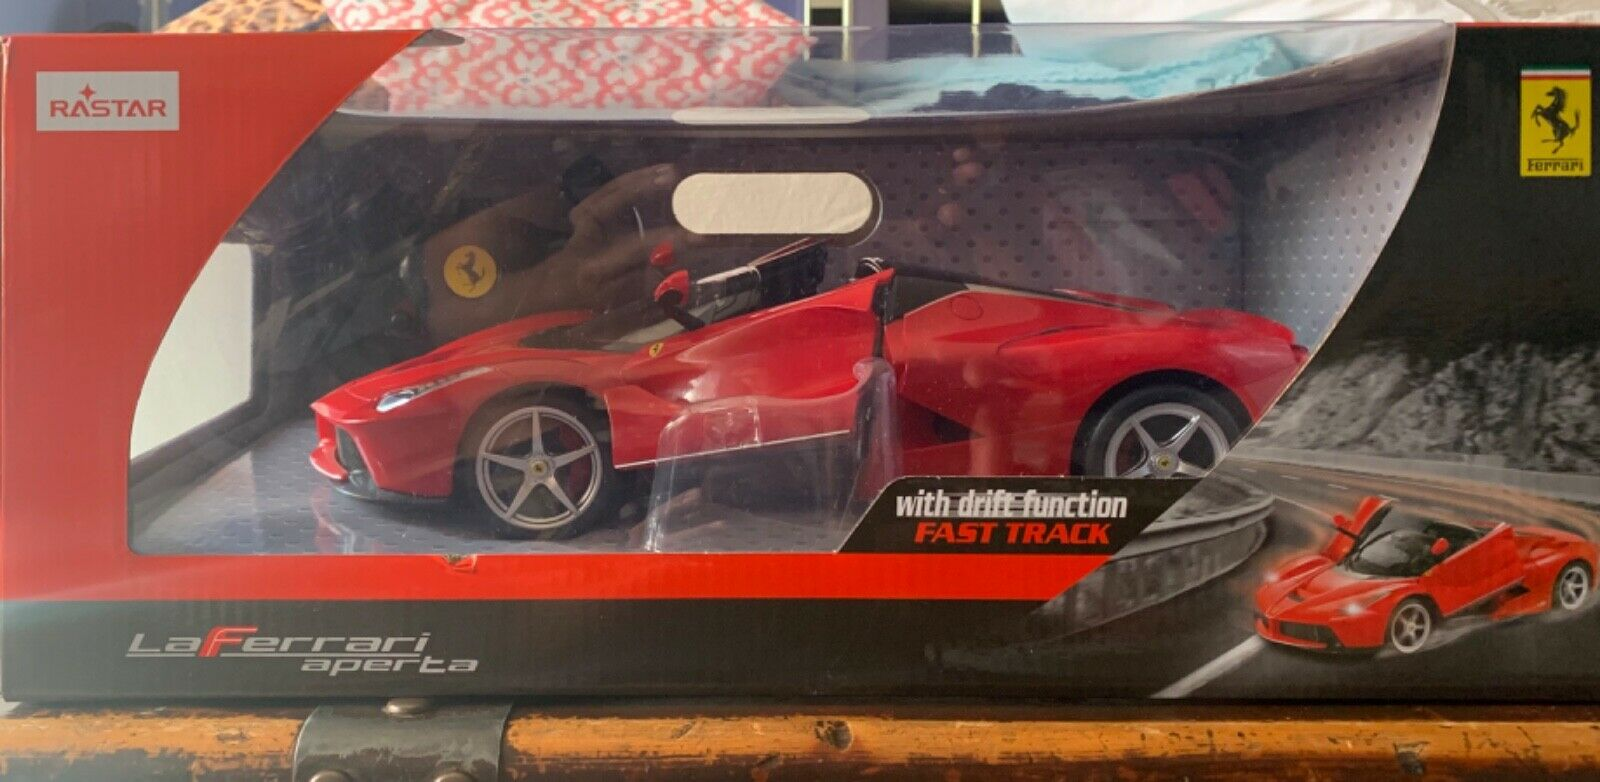 Rastar 1 14 Radio Control Car Ferrari Laferrari Aperta Red 75800 Drift Function For Sale Online